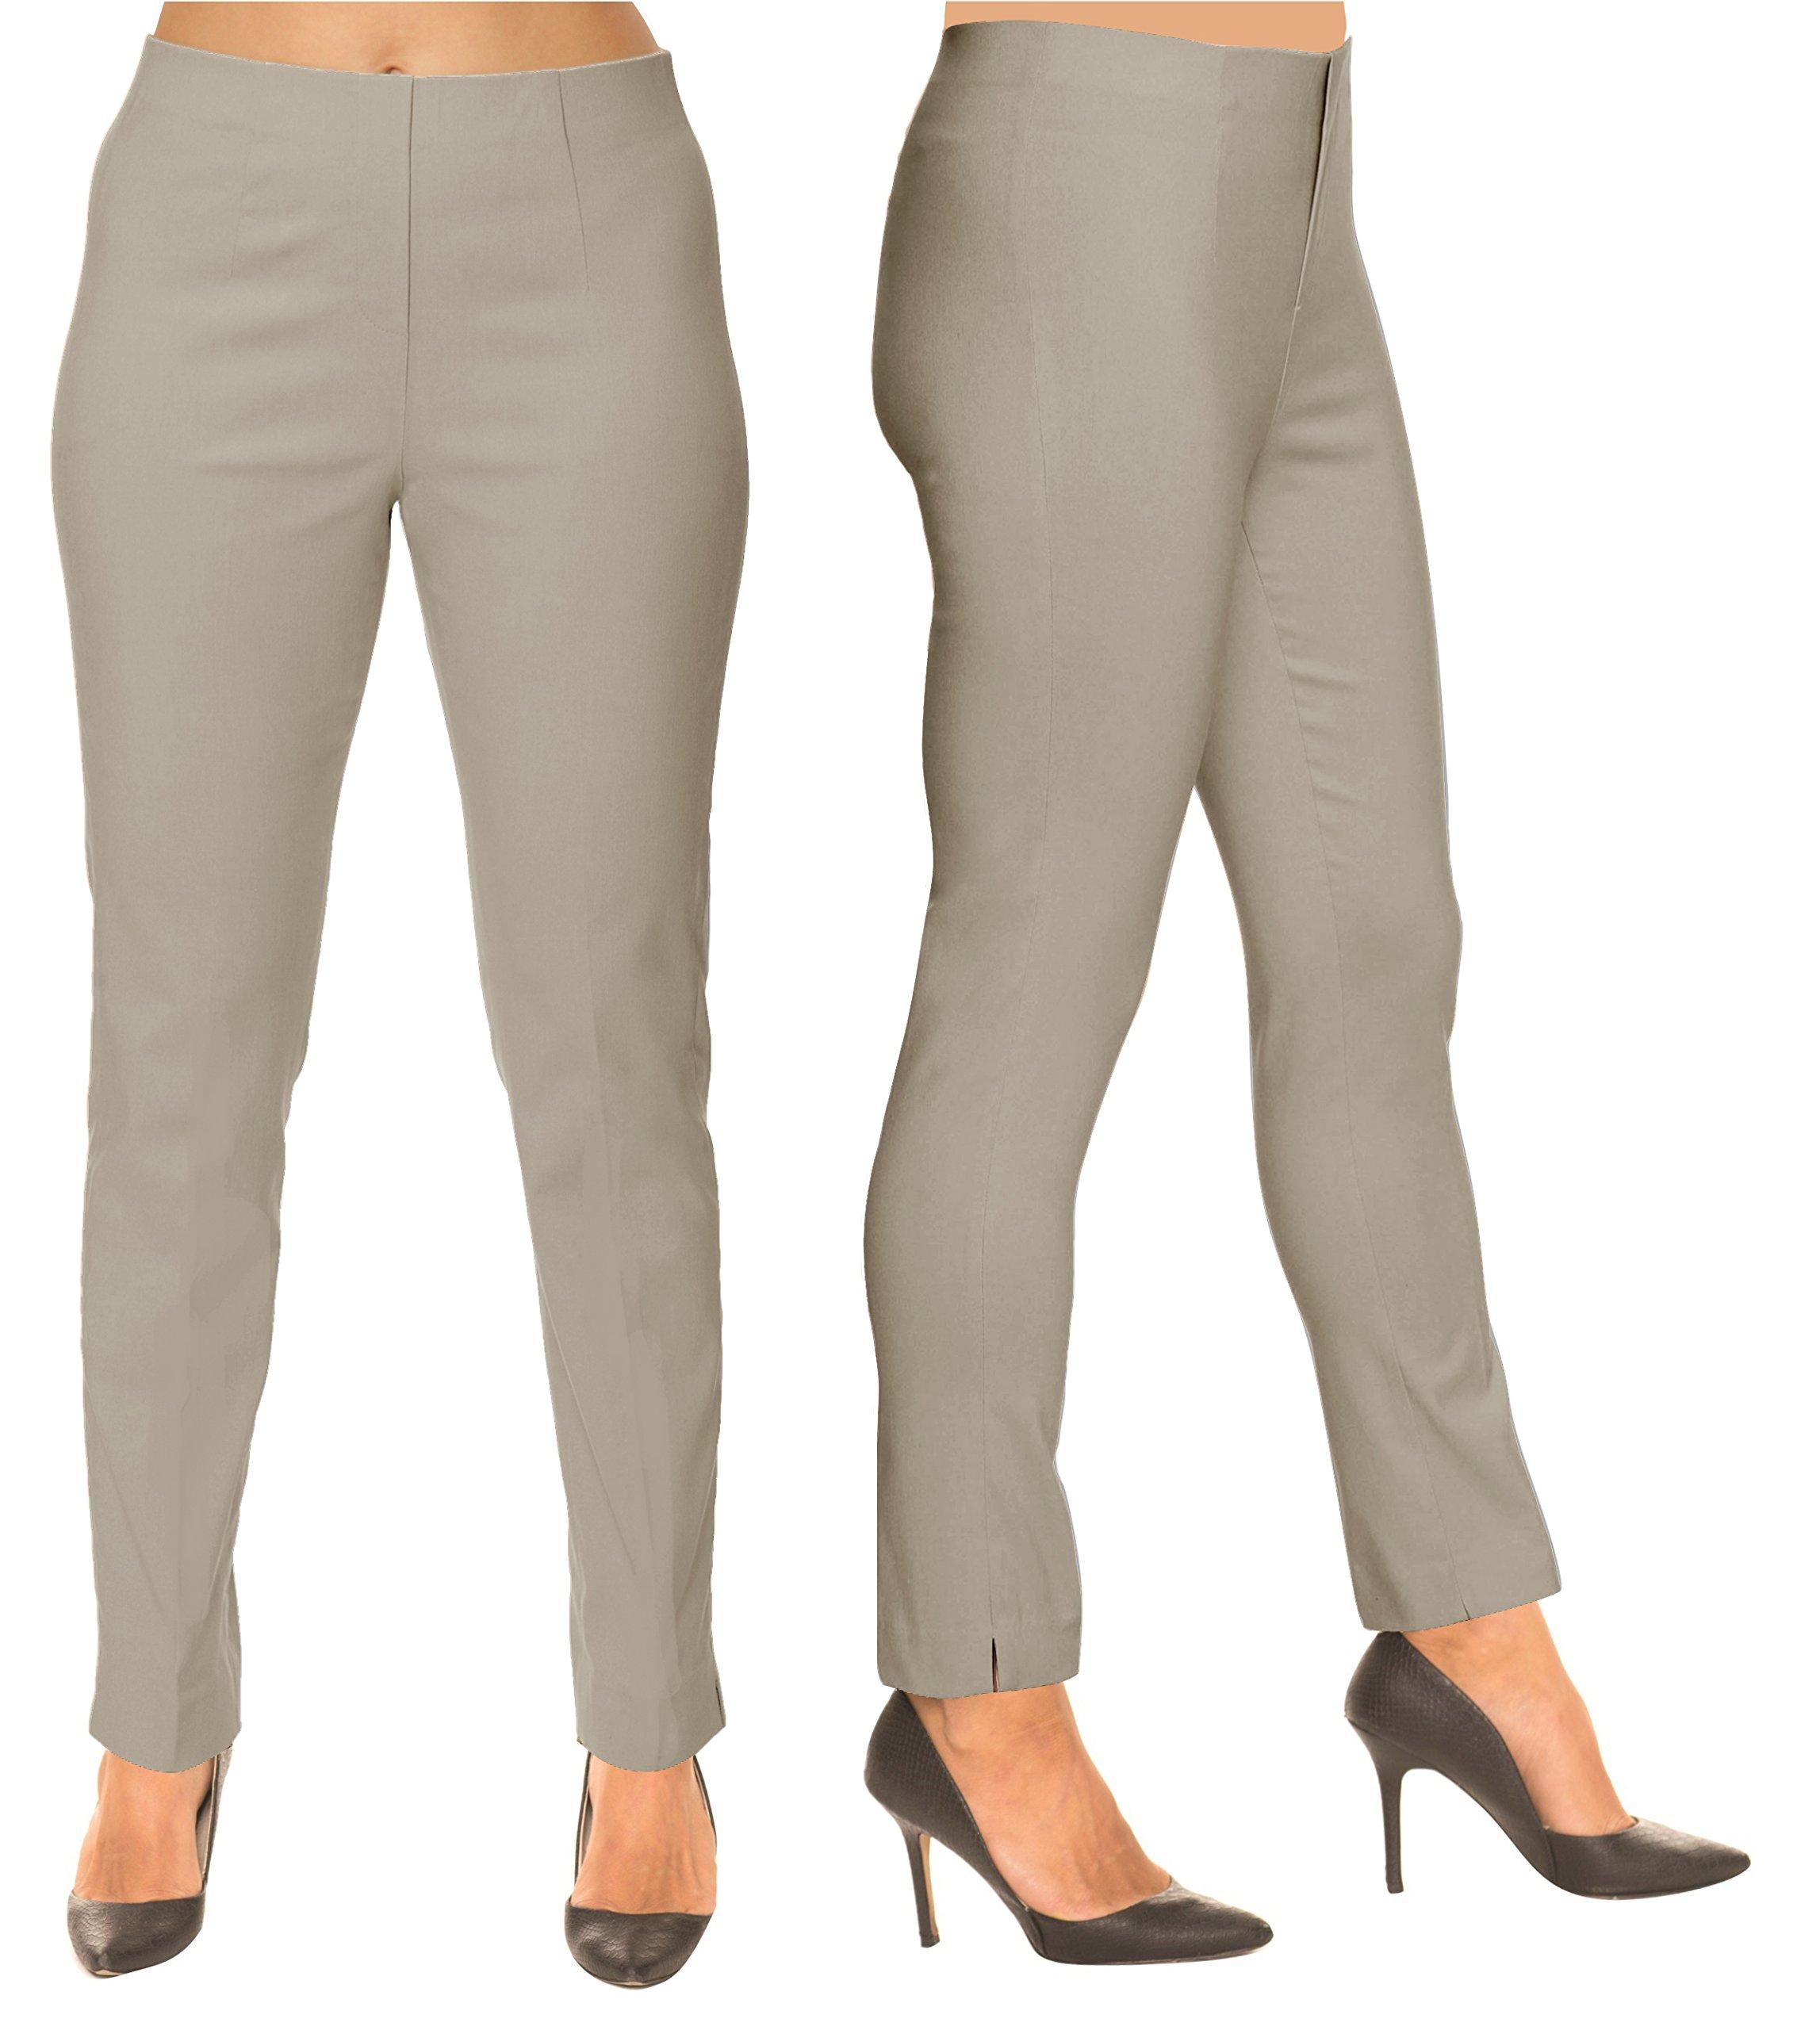 Lior Paris SASHA Essential Slim Fit Ankle Pant (6,Lt Taupe)